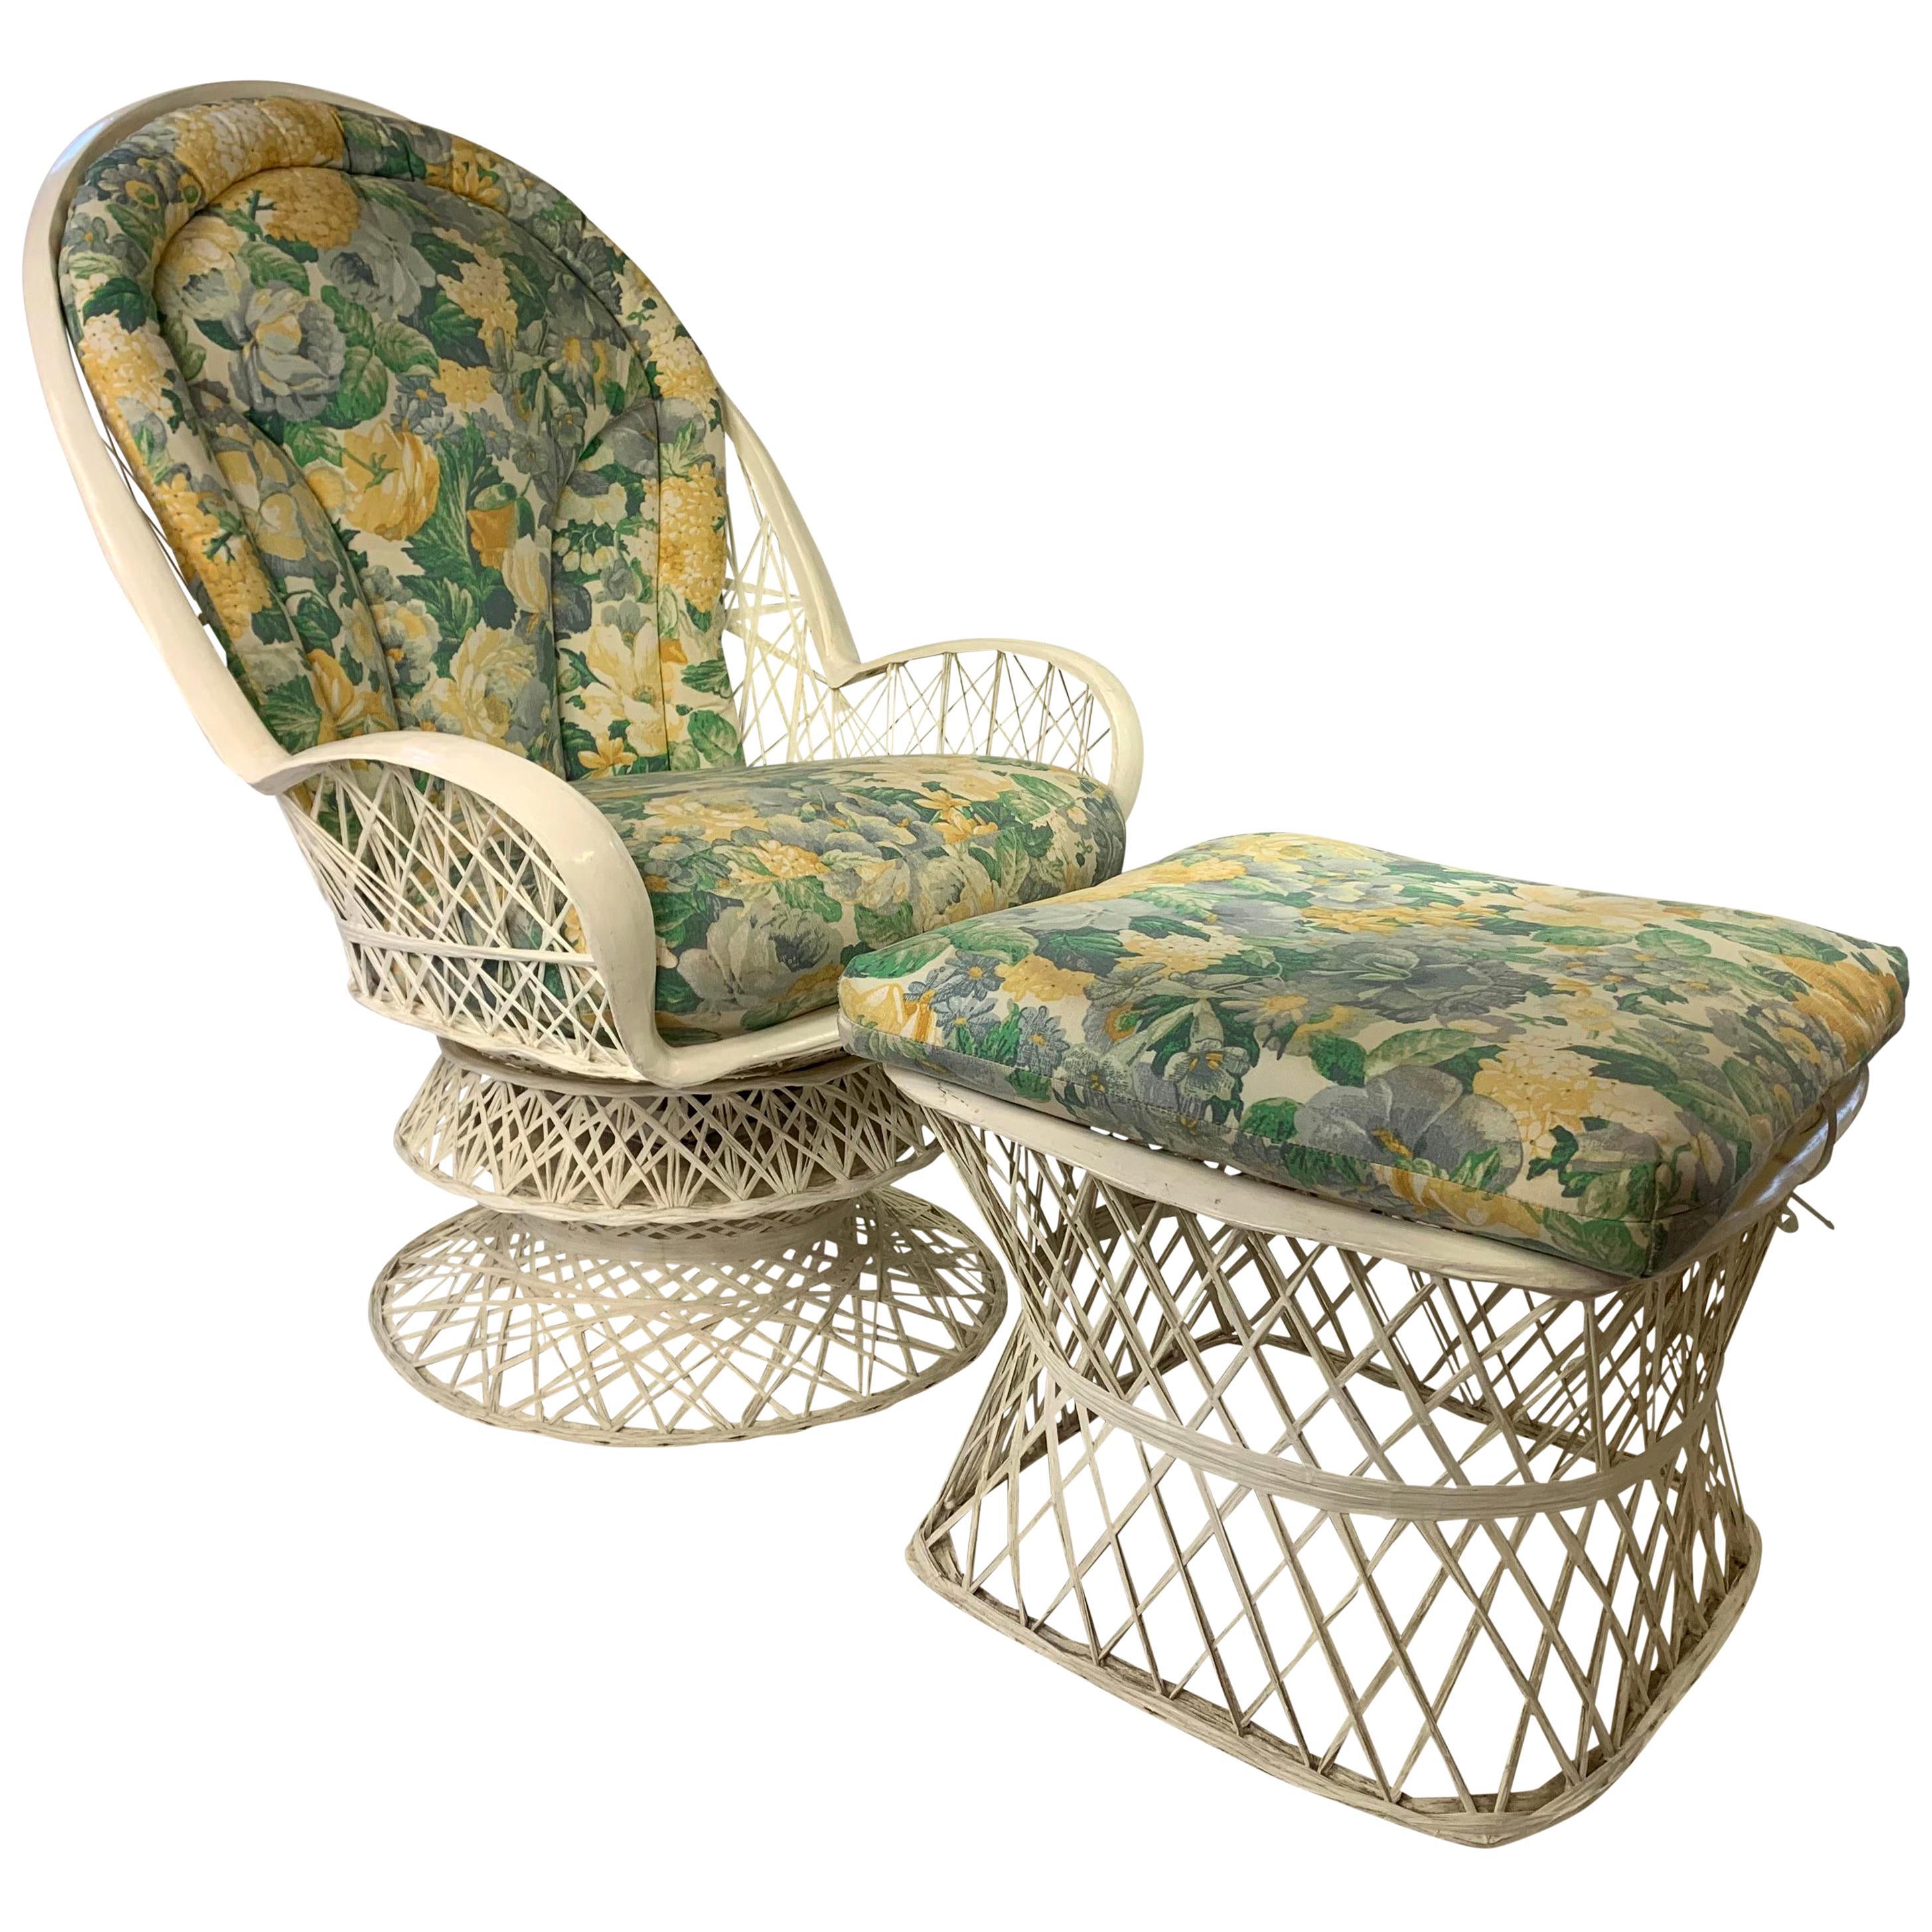 Midcentury Russell Woodard Spun Fiberglass Swivel Lounge Chair and Ottoman